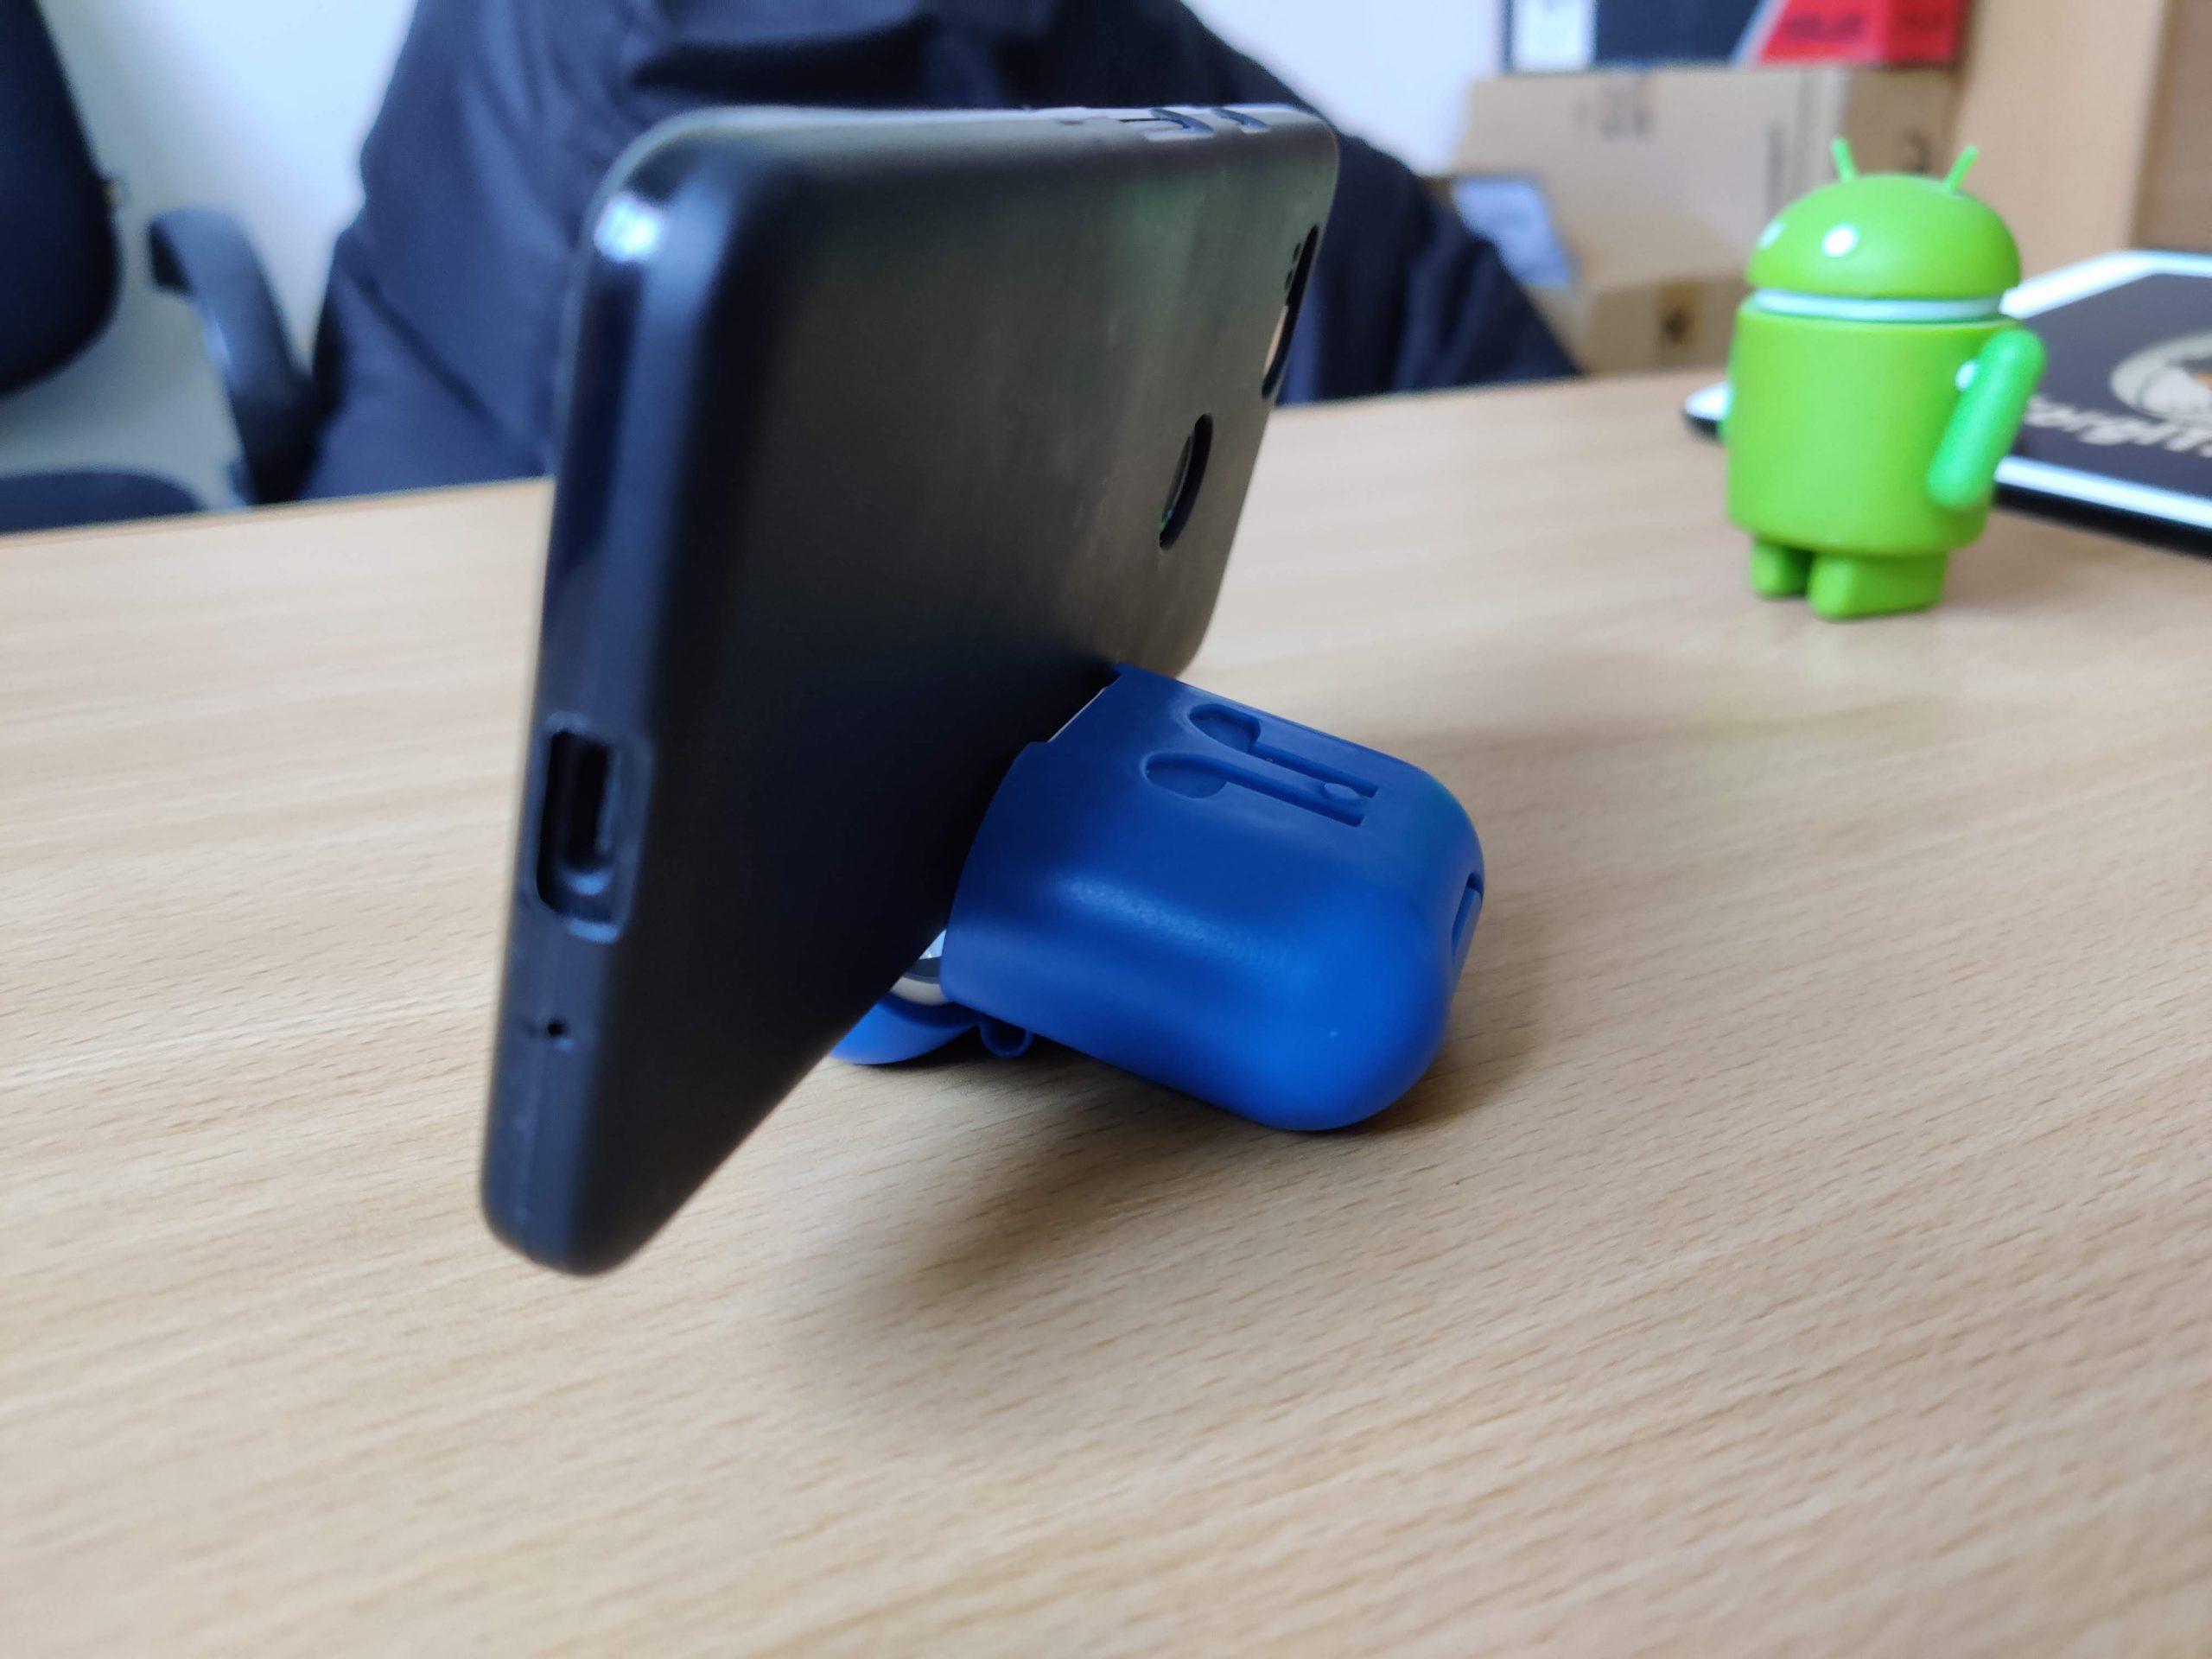 Подставка для смартфона из кейса AirPods